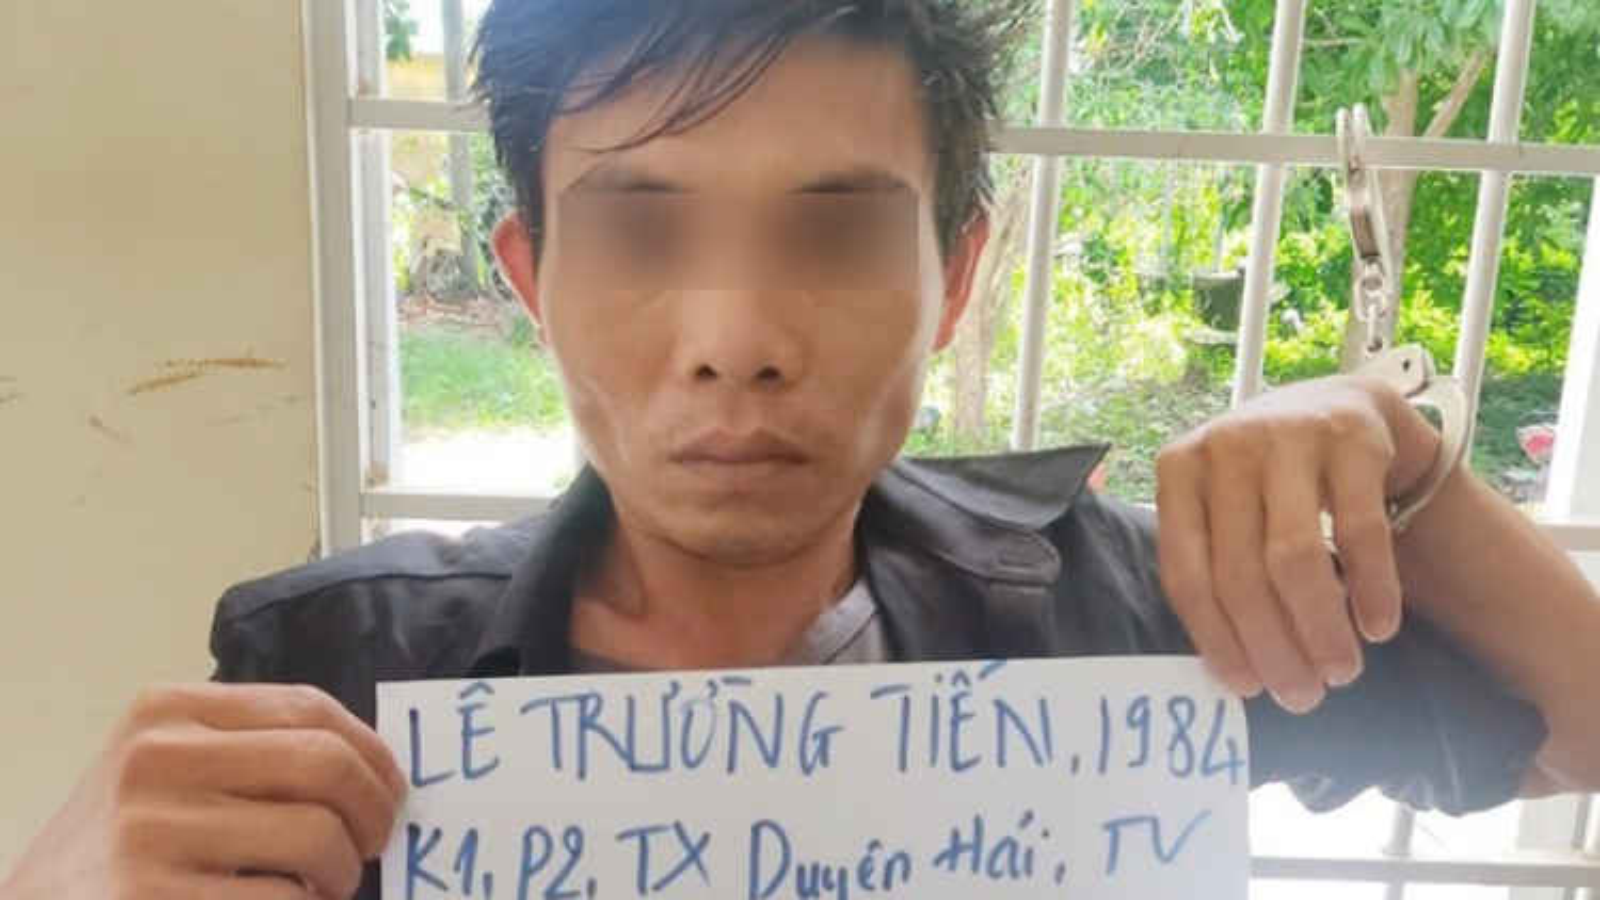 Bắt giam kẻ cầm dao kề cổ đòi hiếp dâm 2 nữ sinh